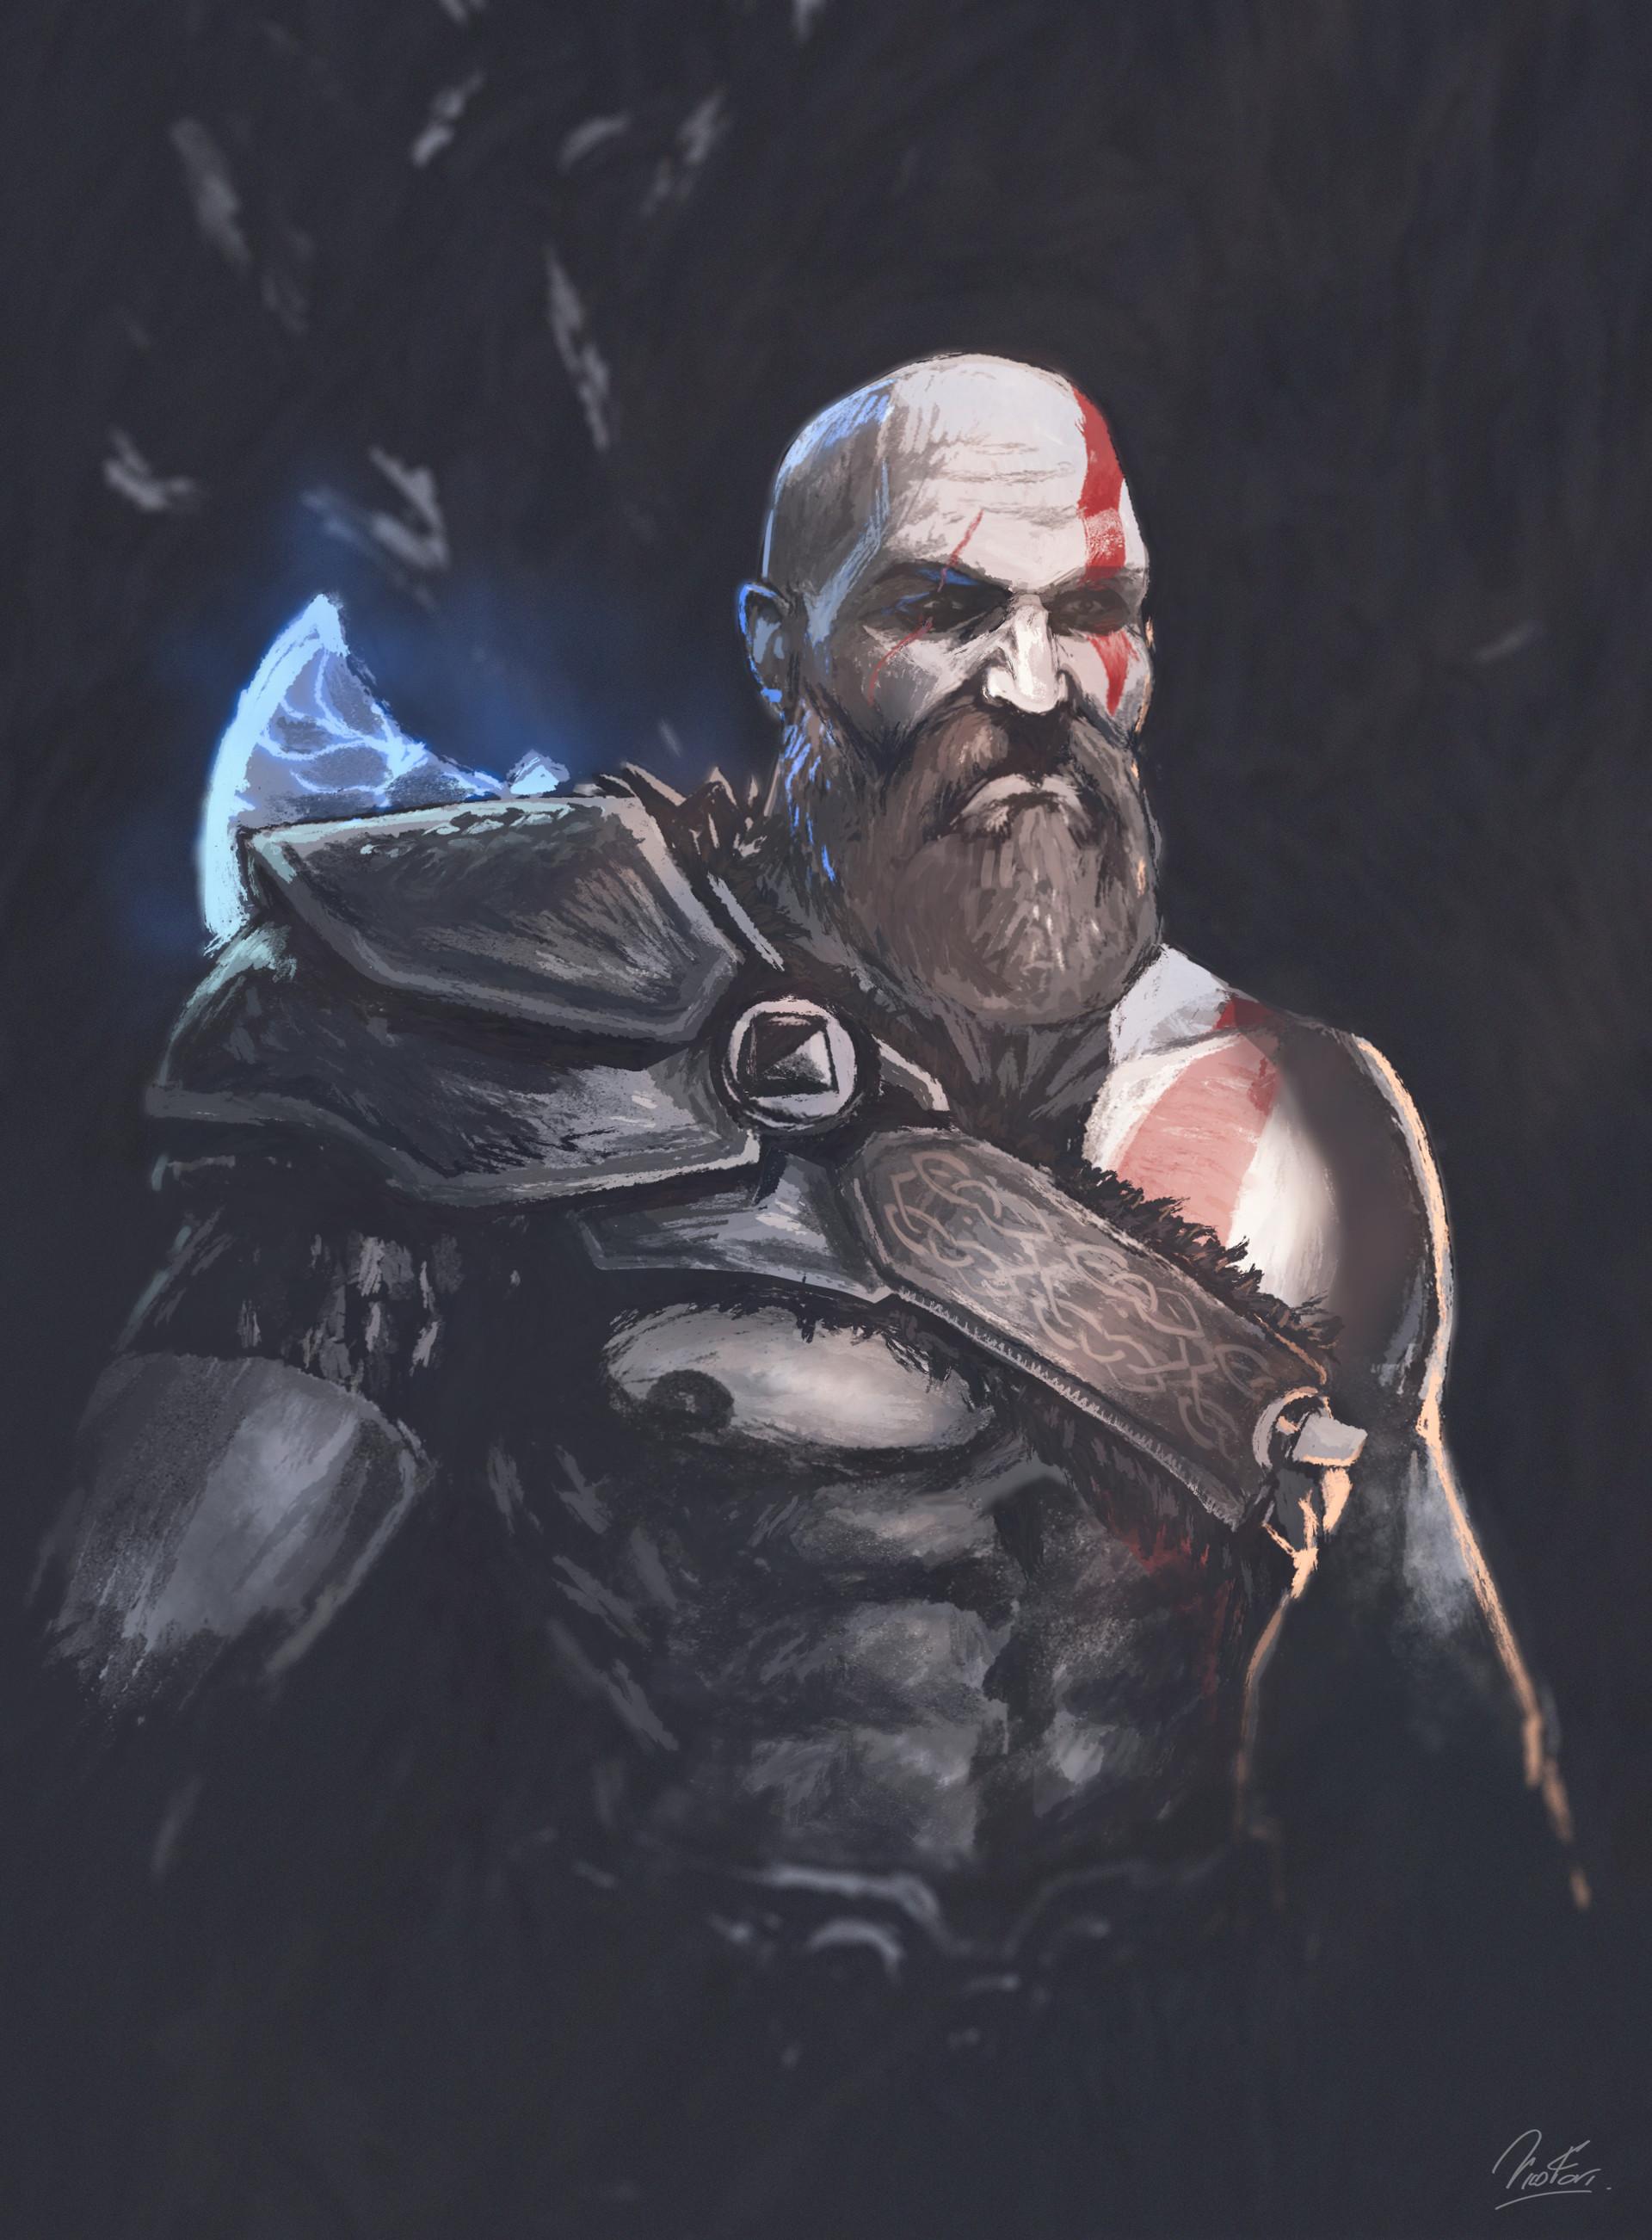 Nico fari kratos